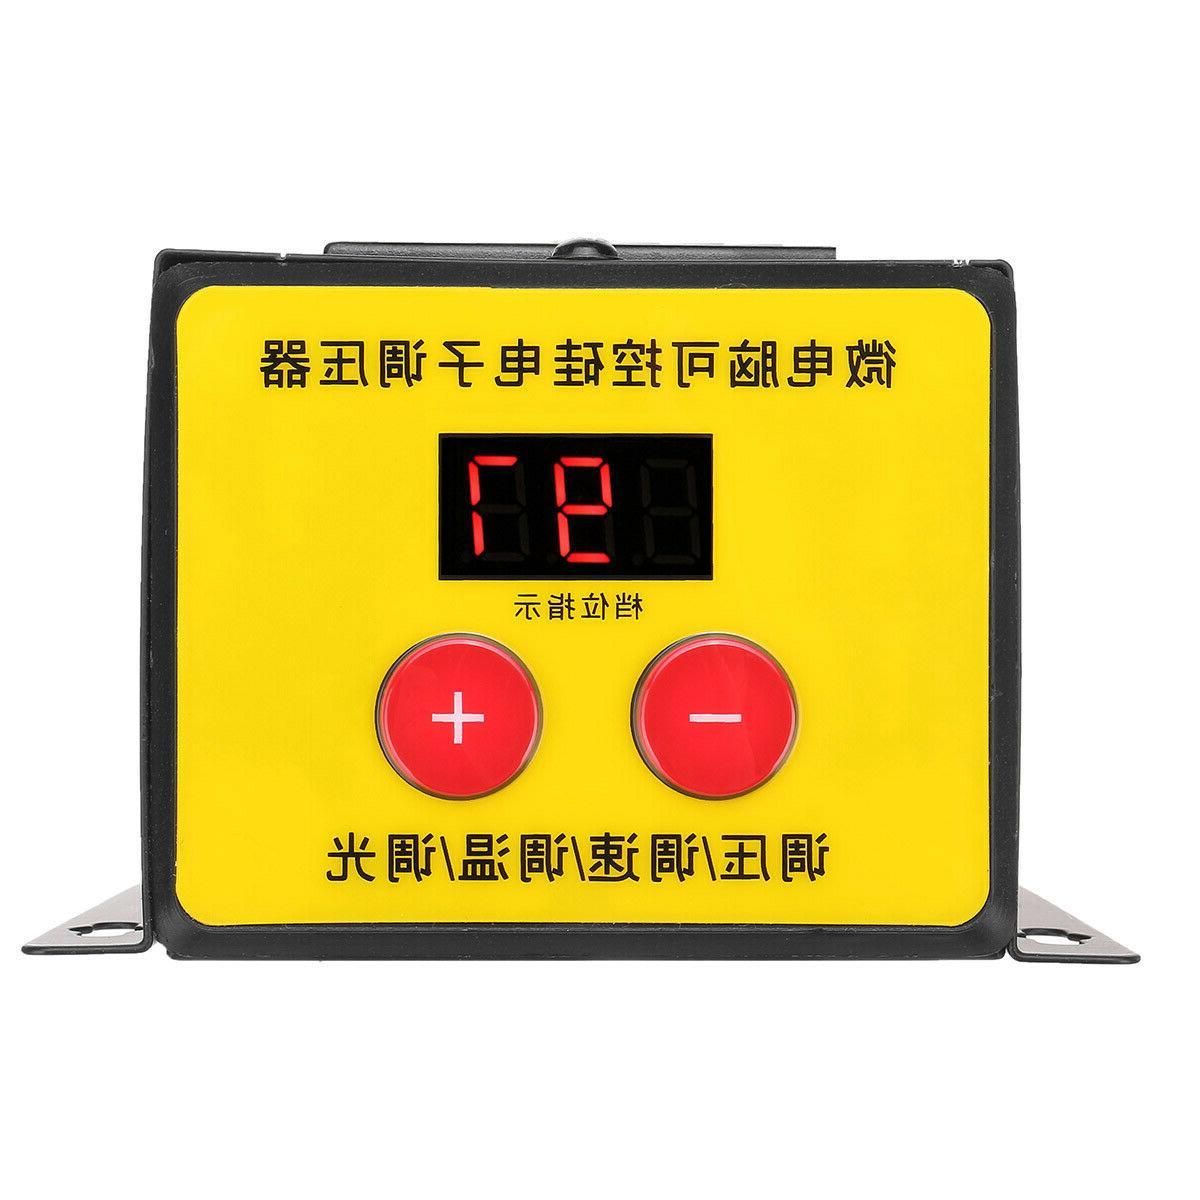 AC 220V Voltage Power Motor